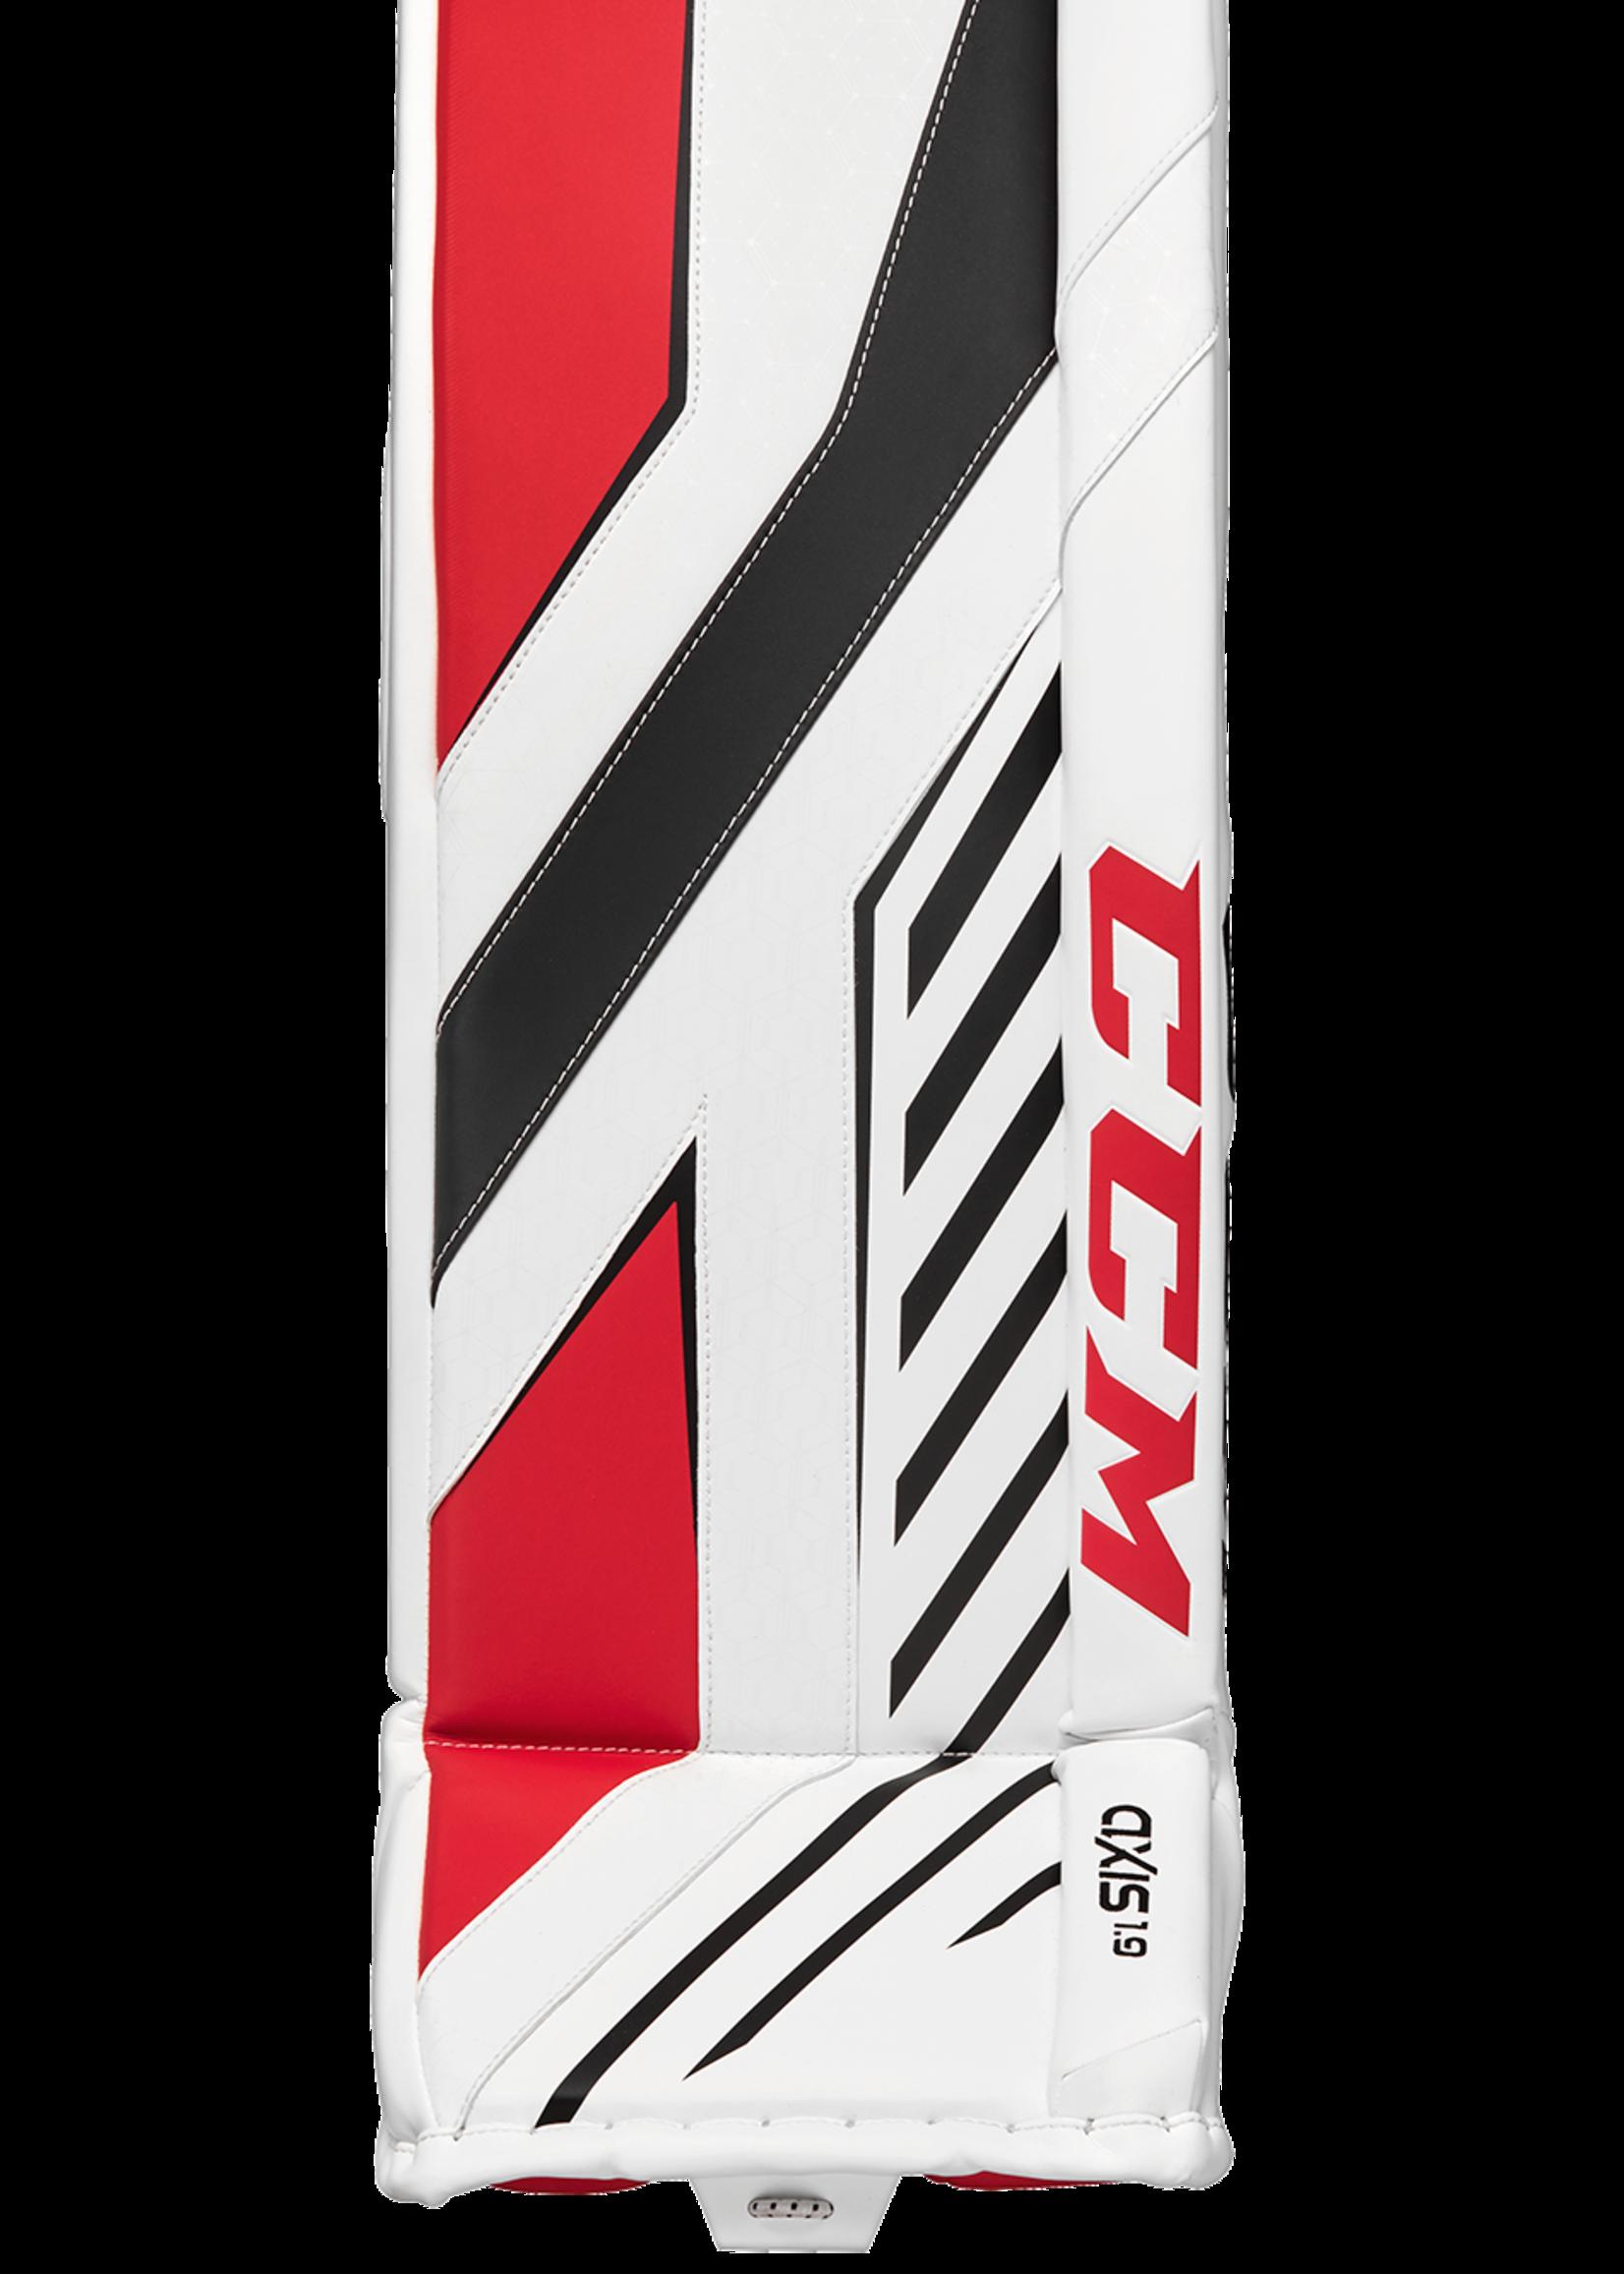 CCM Axis 1.9 Senior Goalie Pads